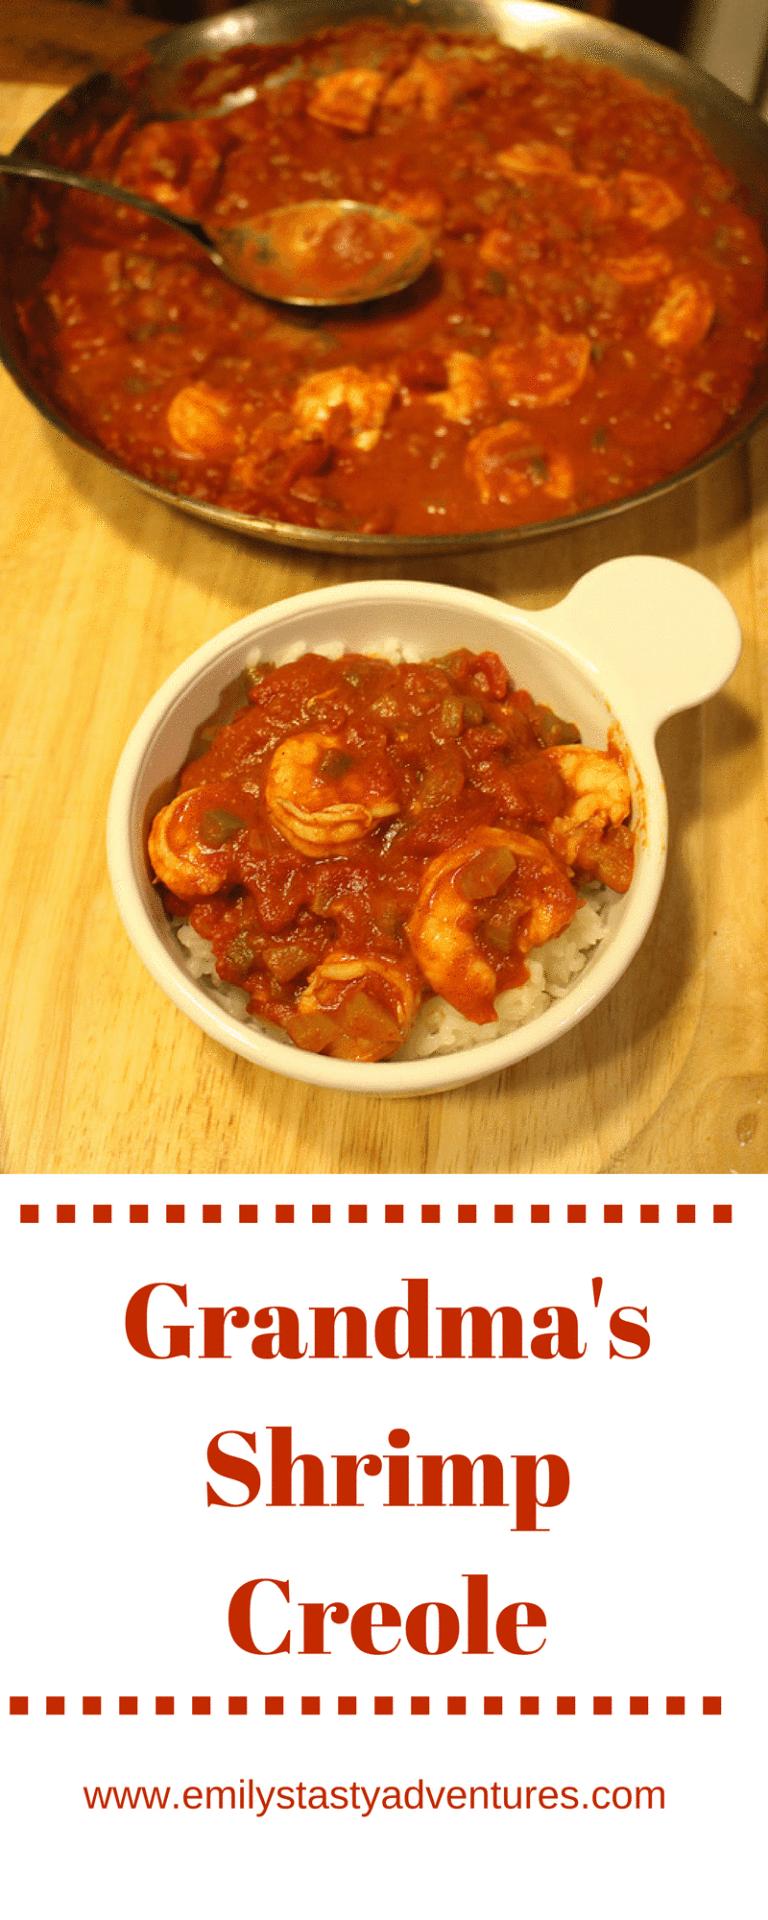 Grandma In Creole : grandma, creole, Grandma's, Shrimp, Creole, Recipes,, Creole,, Recipes